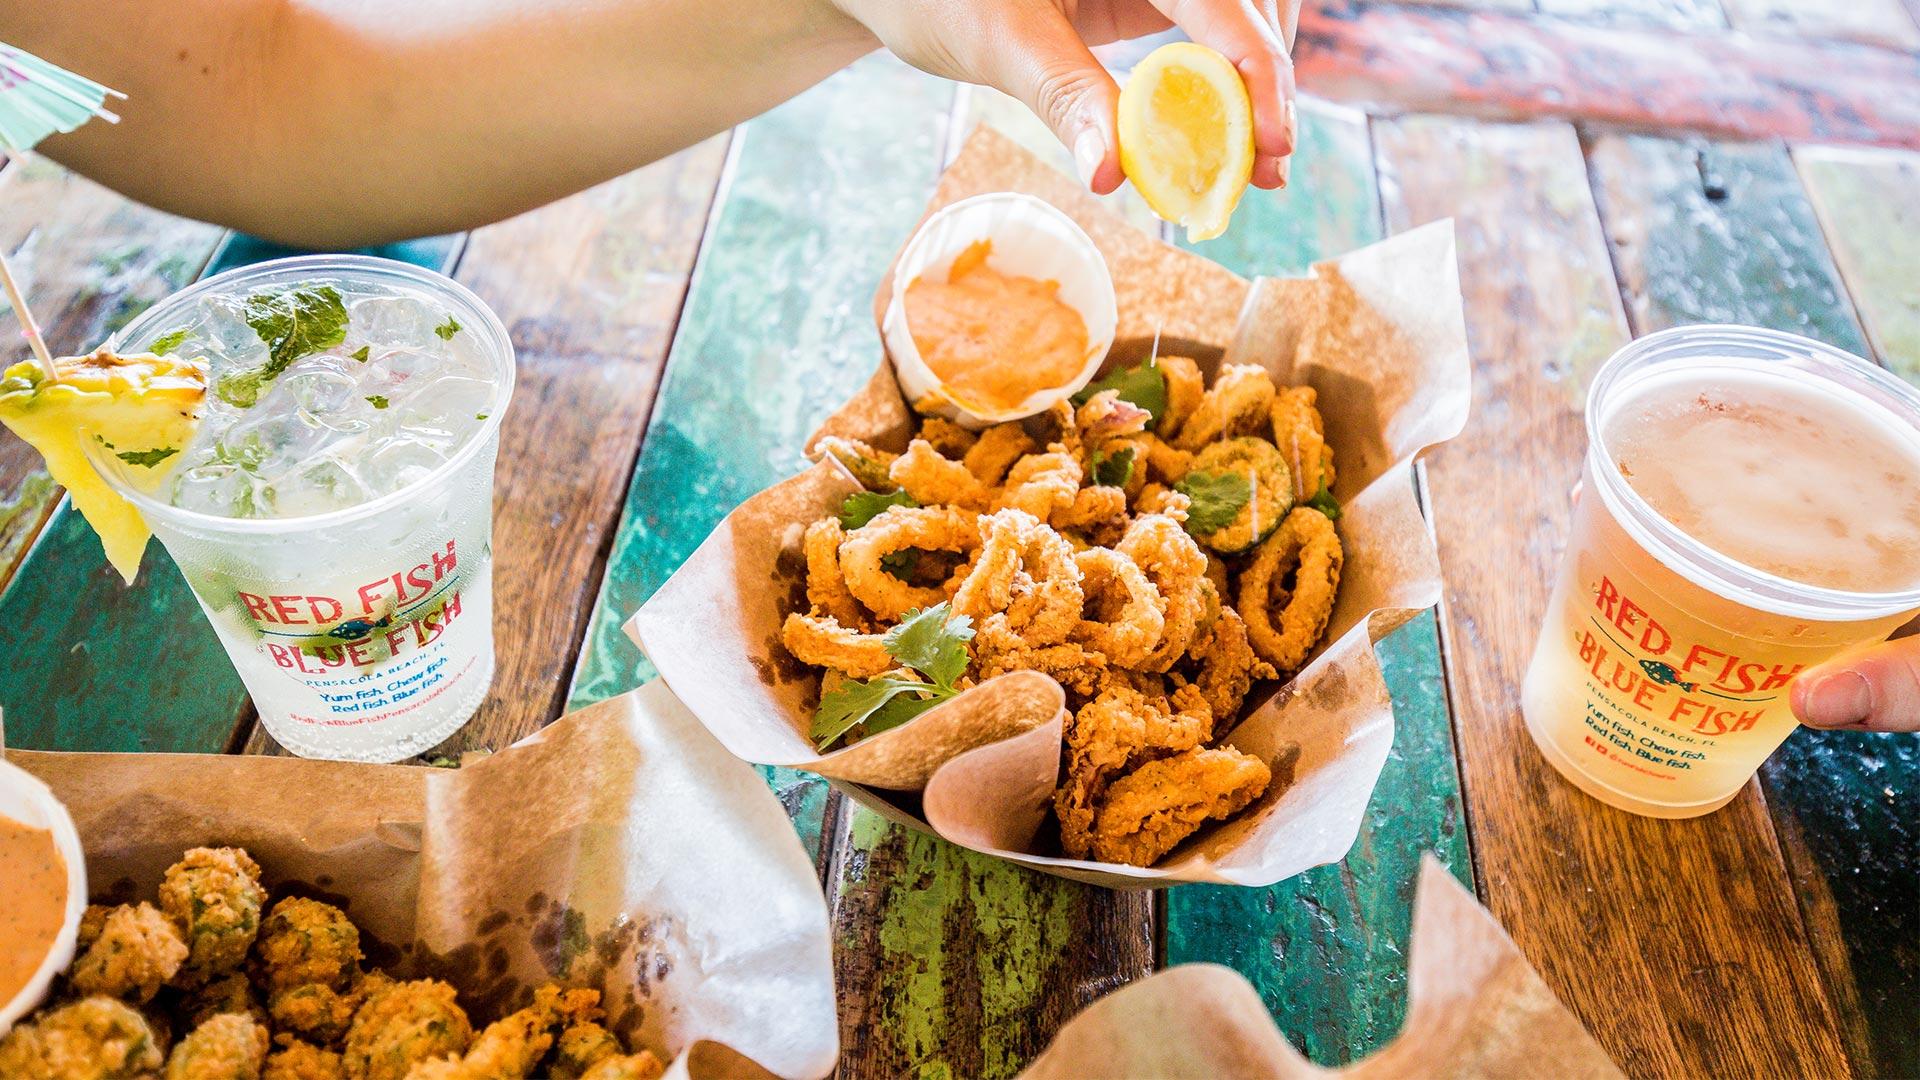 Small Bites | Fried Okra + Pimento Cheese + Calamari | Red Fish Blue Fish Pensacola Beach